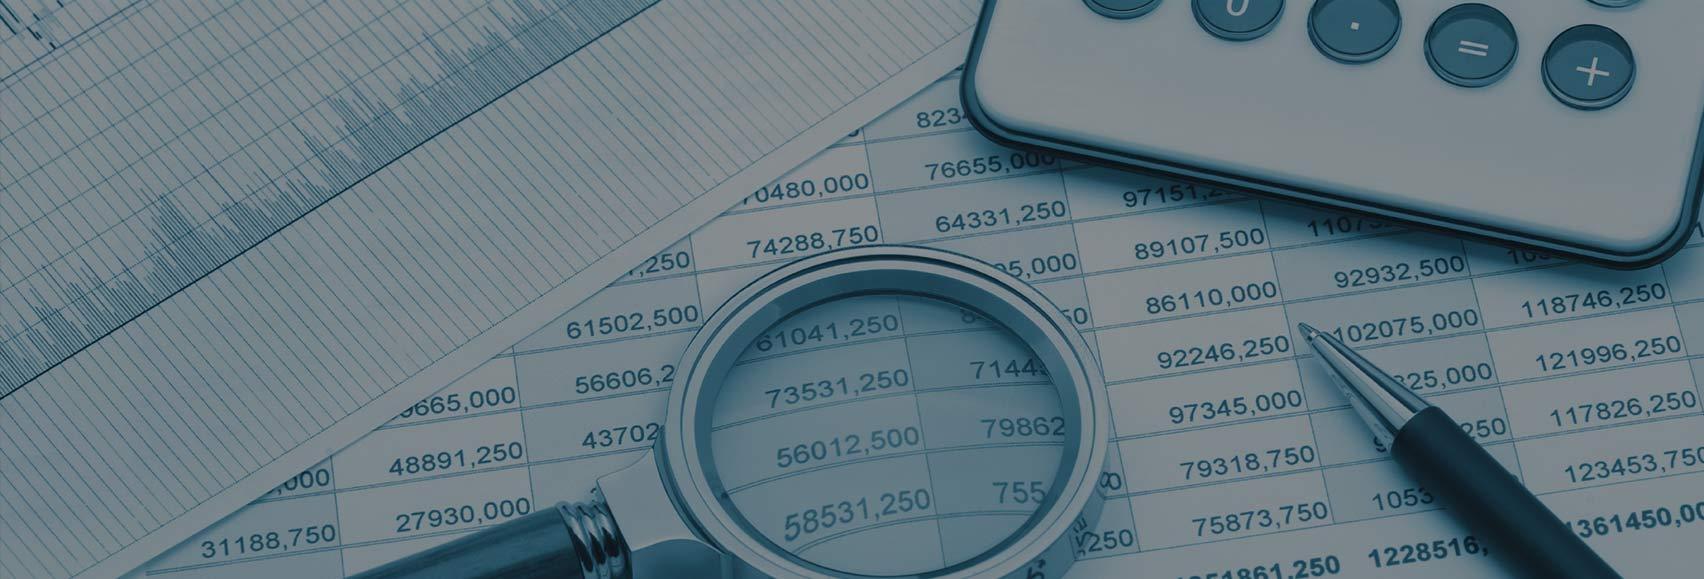 Hife-header-finance-papers